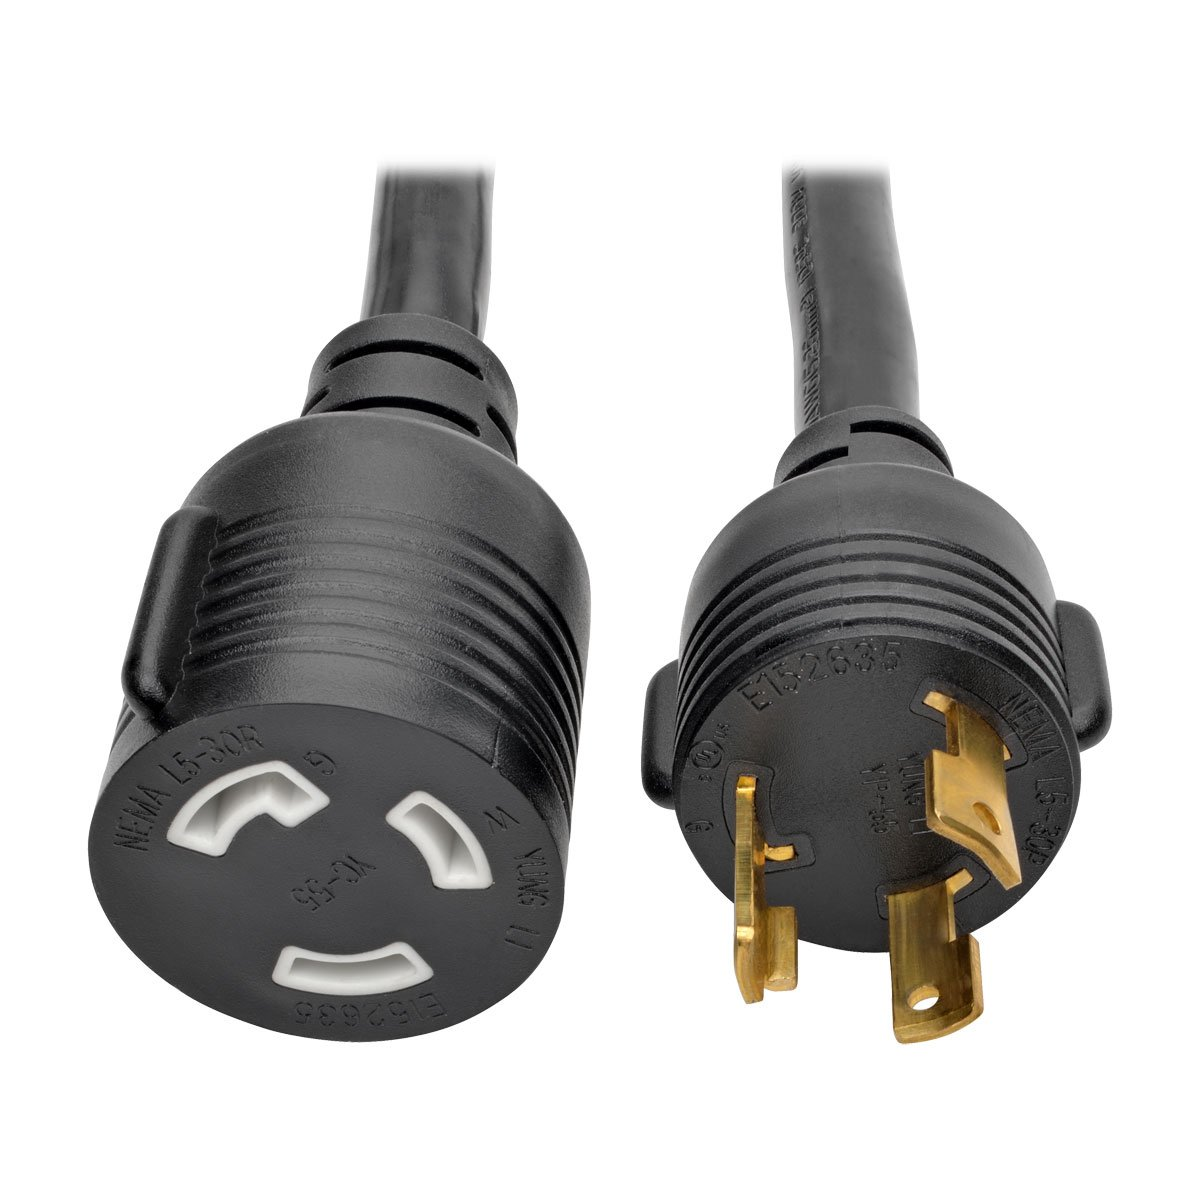 TRIPP LITE Heavy Duty Power Extension Cord 30A 10 AWG L5-30P to L5-30R Locking Connectors 6', Black (P046-006-LL-30A) by Tripp Lite